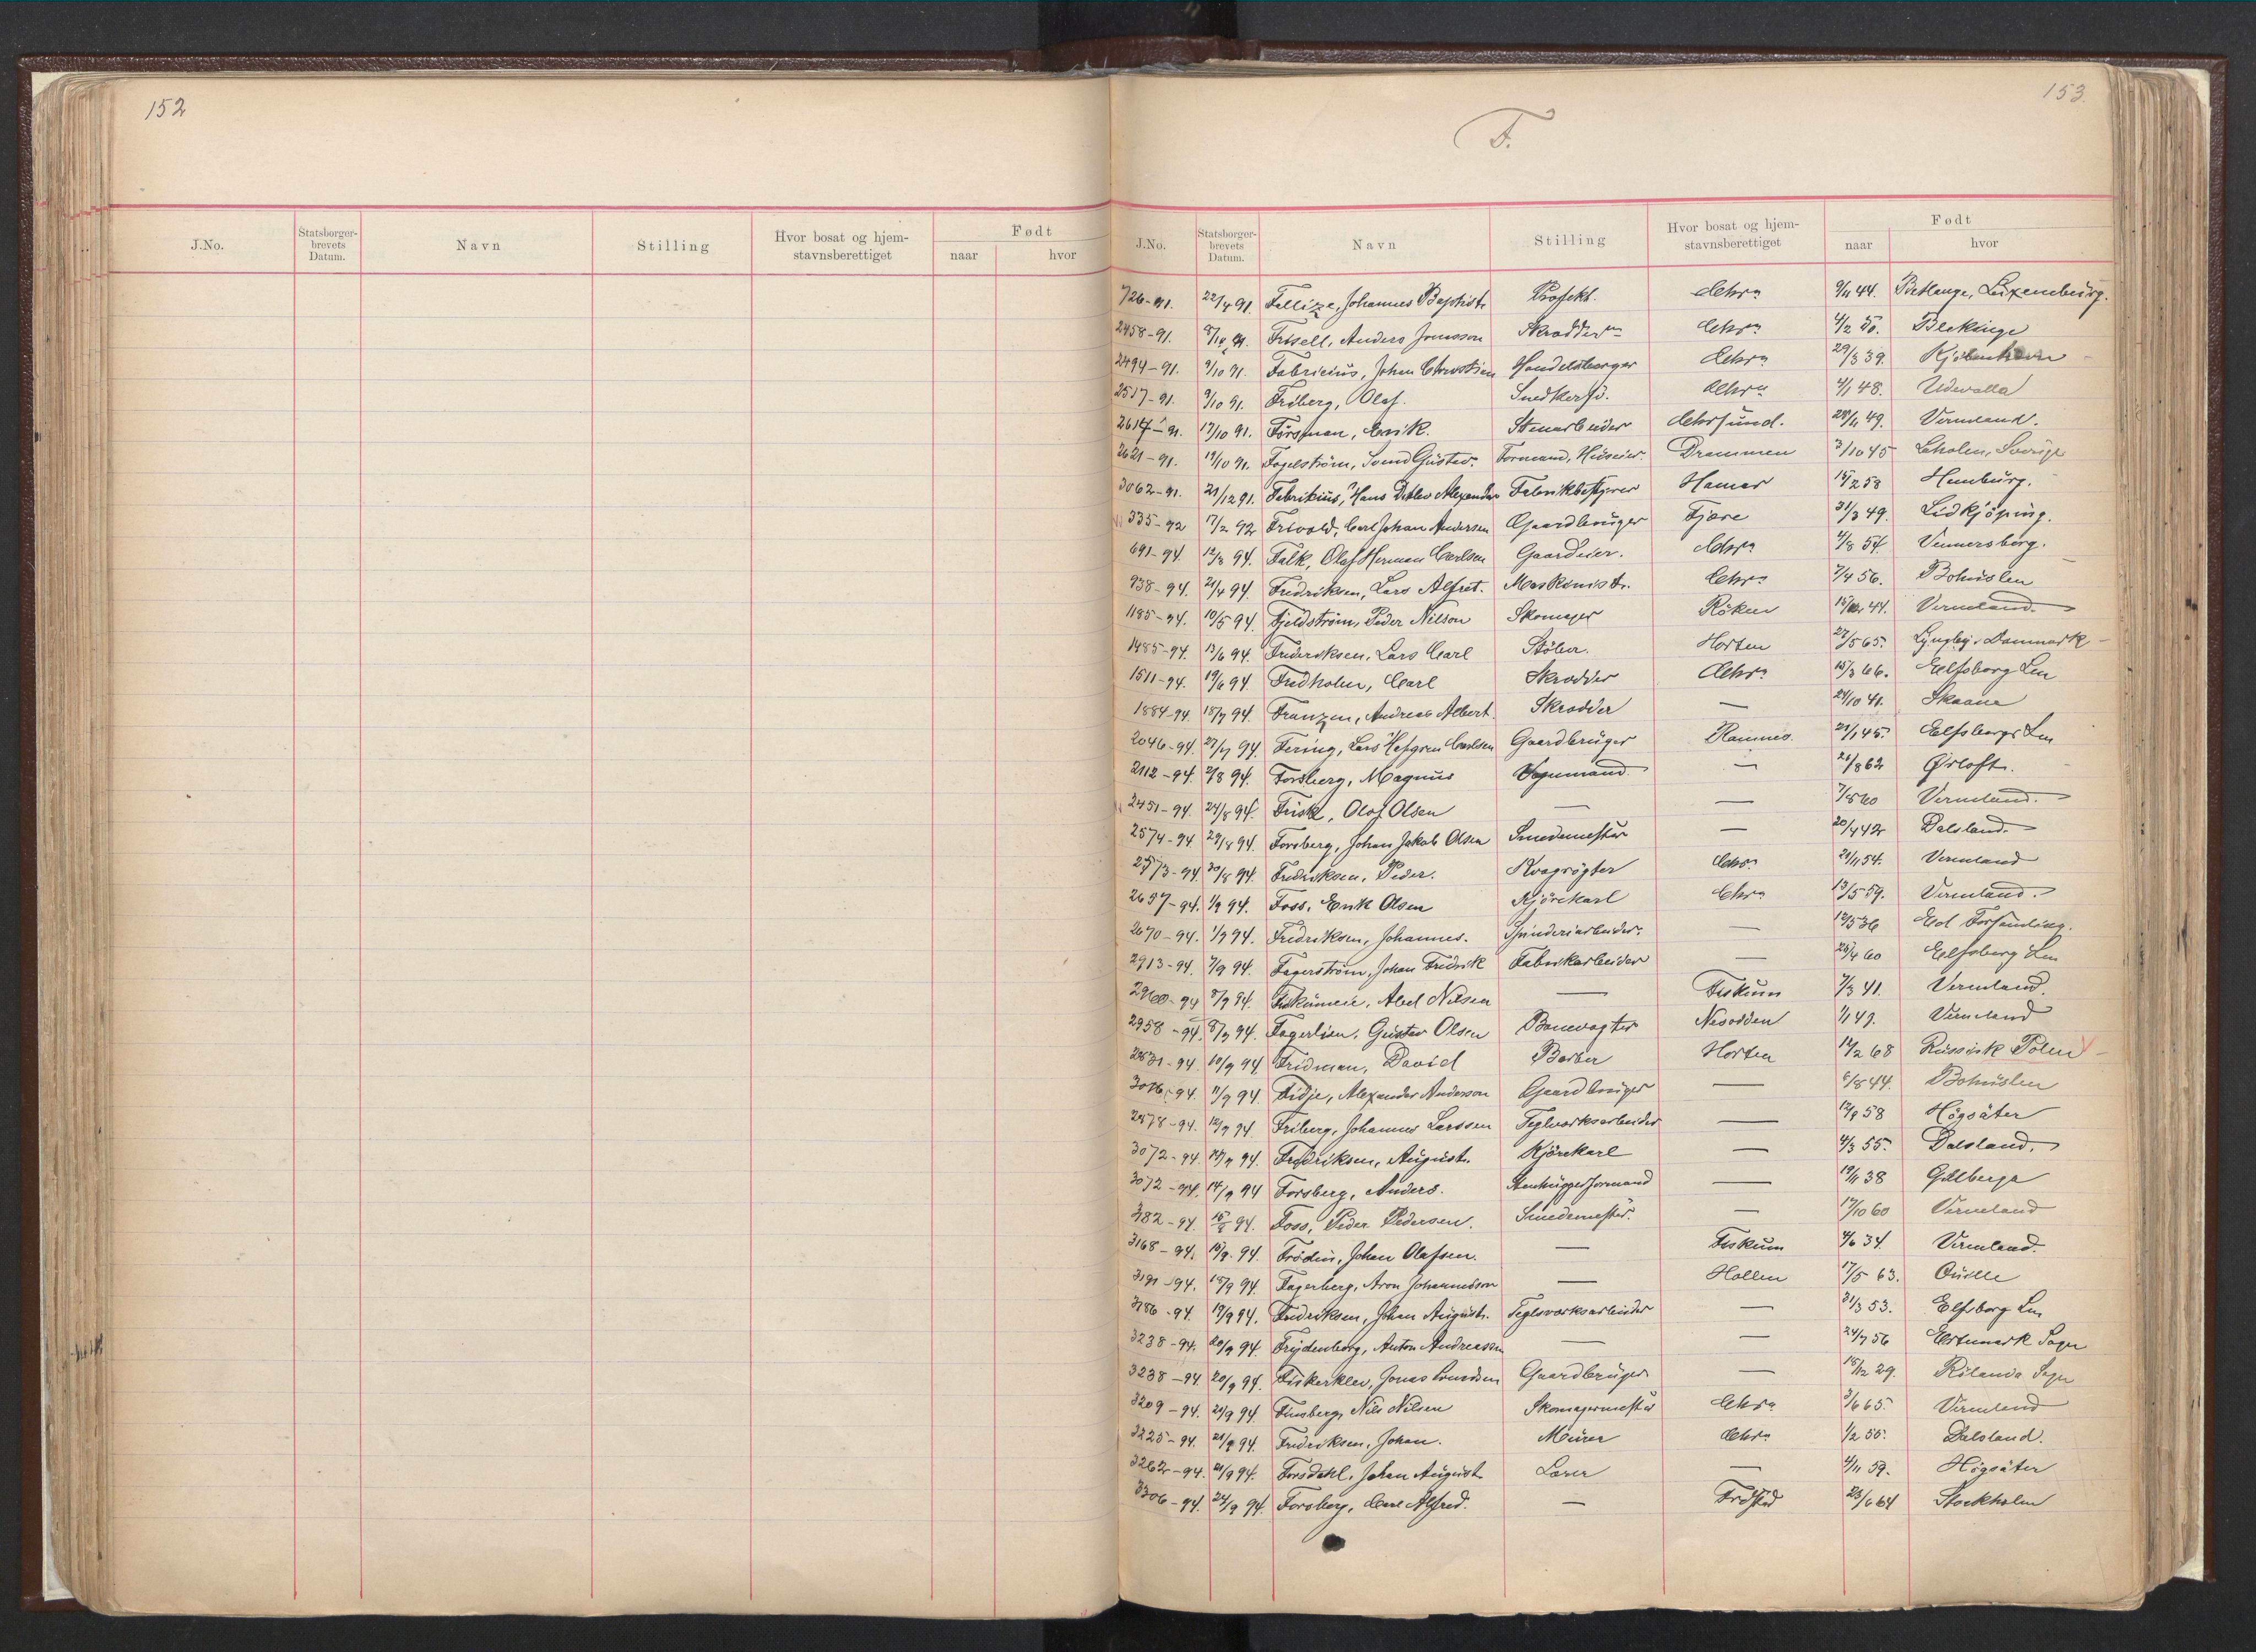 RA, Justisdepartementet, 3. politikontor P3, C/Cc/L0001: Journal over statsborgersaker, 1891-1946, s. 152-153